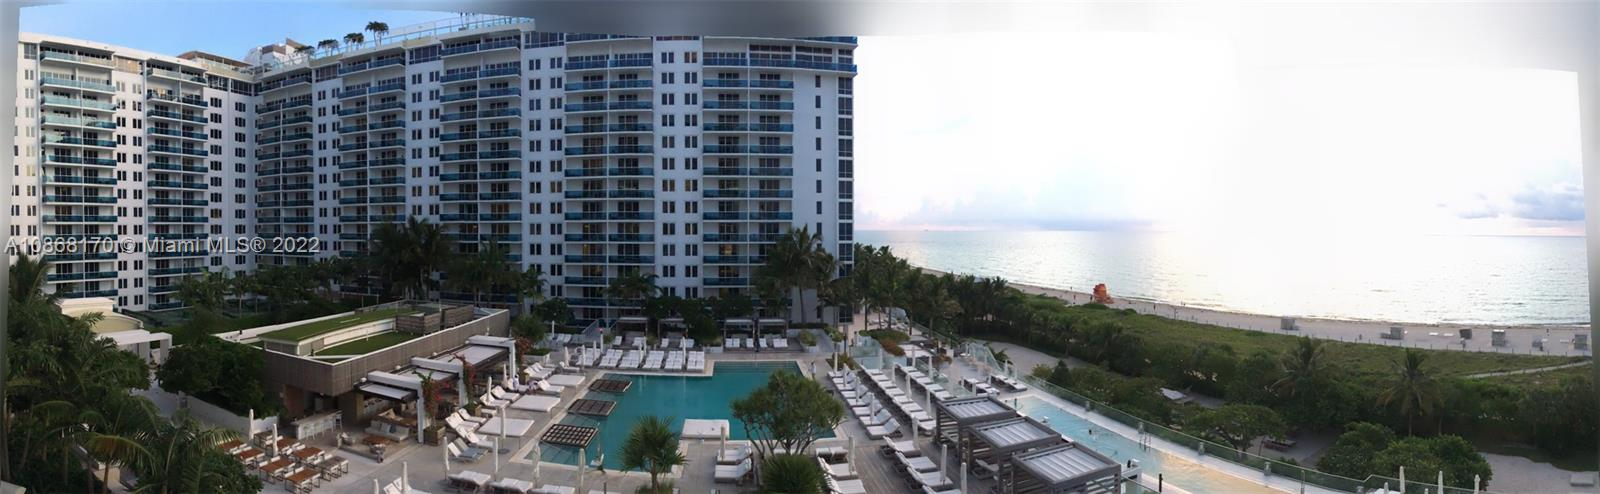 Roney Palace #711 - 2301 COLLINS AV #711, Miami Beach, FL 33139